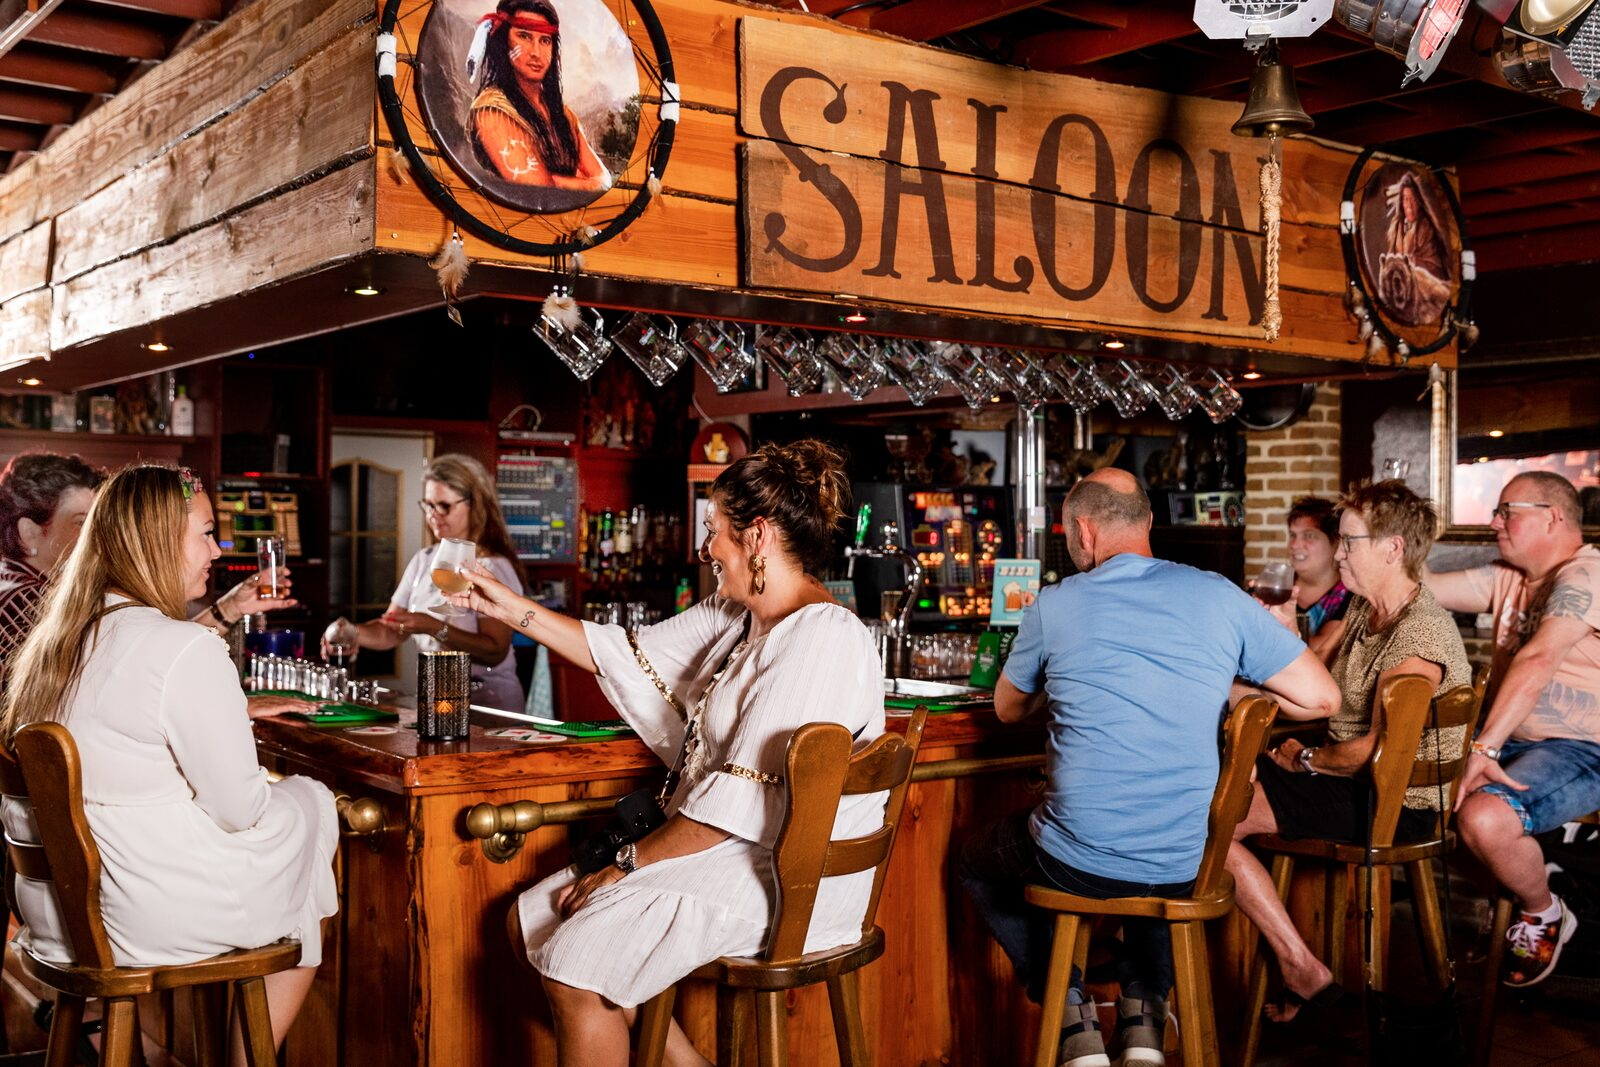 Cafe De Saloon